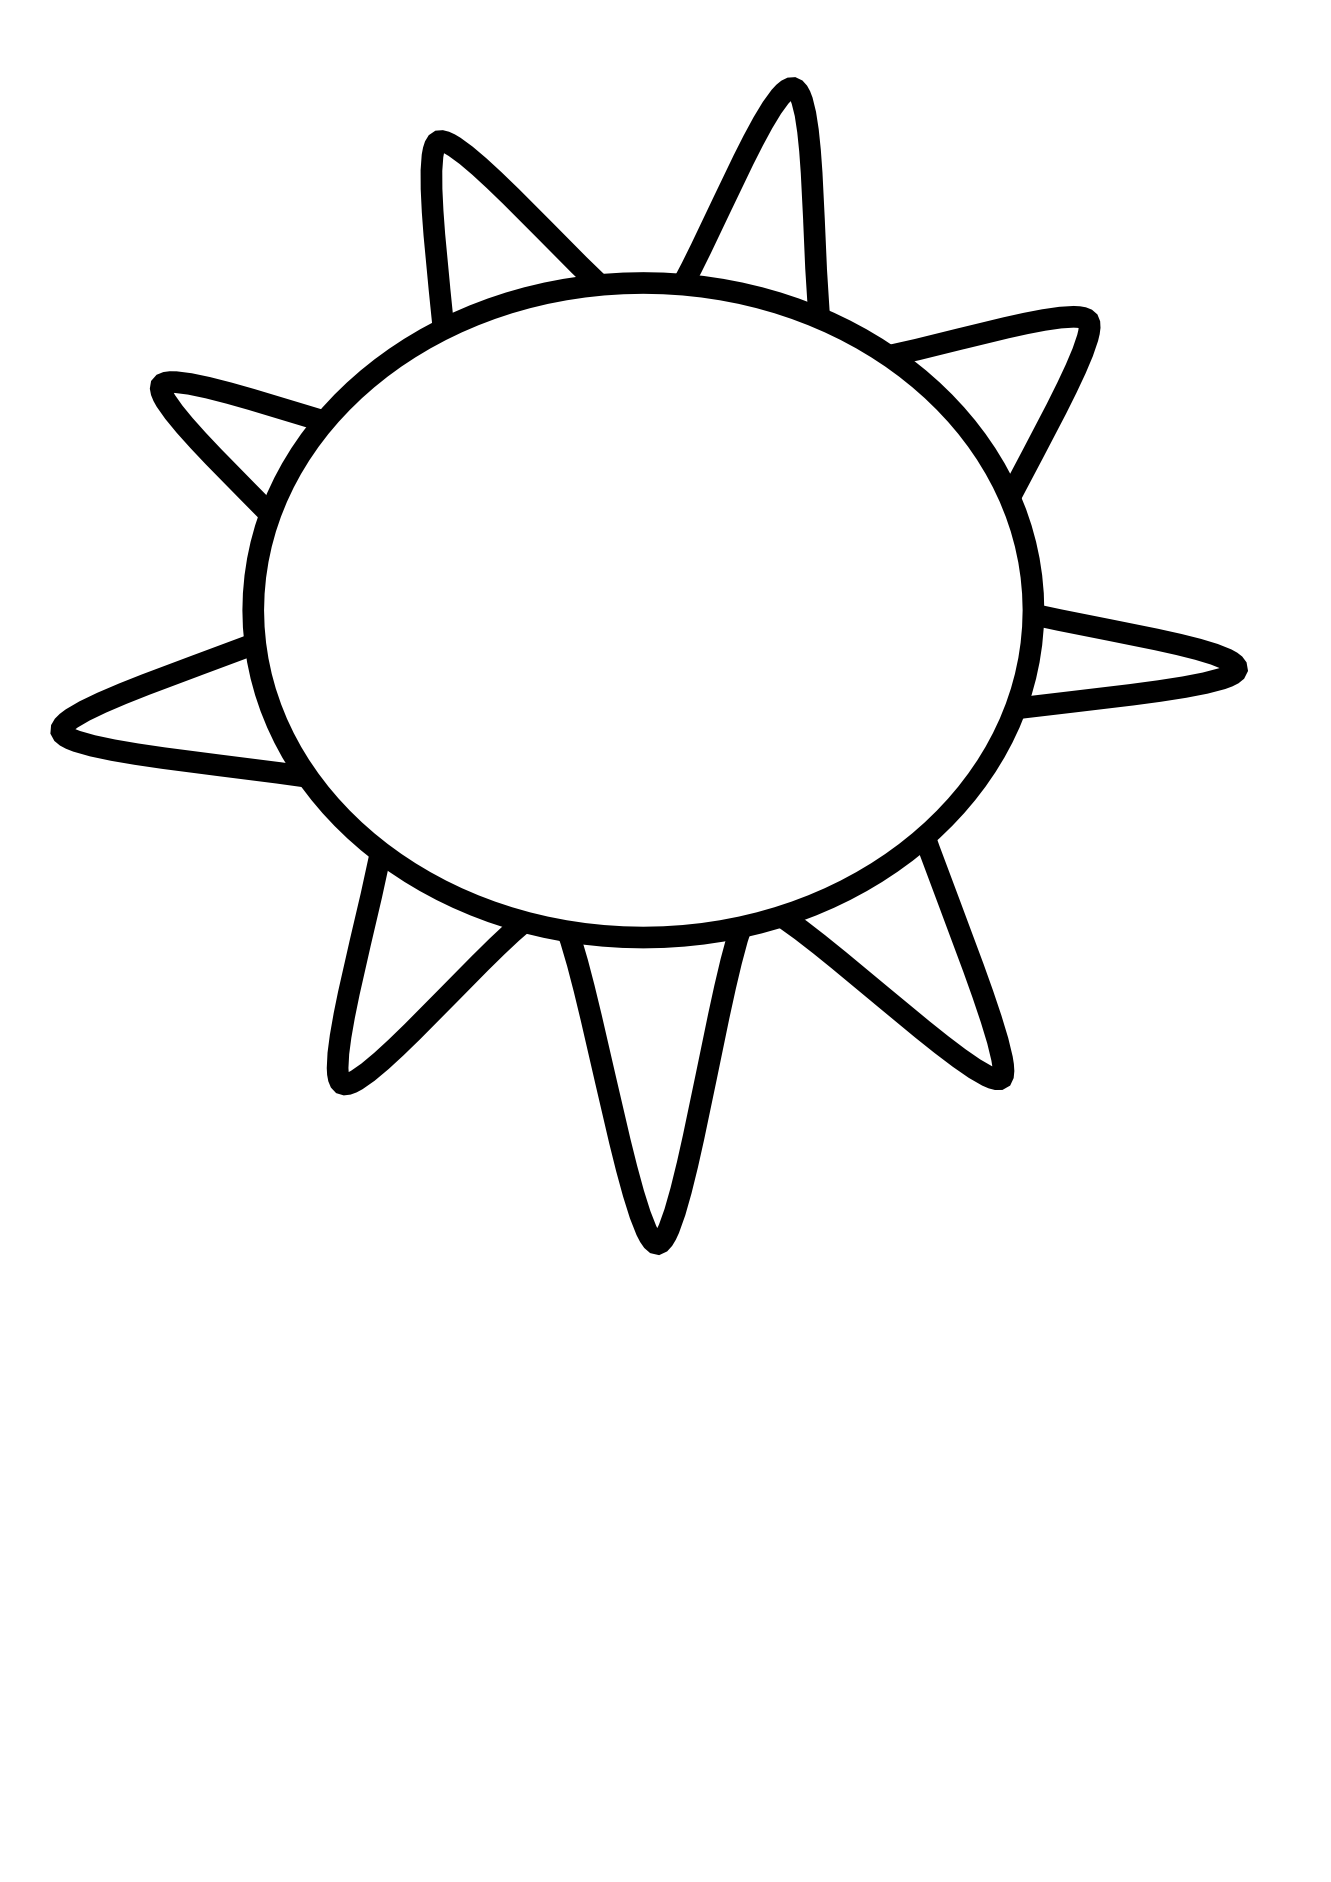 1331x1882 Half Sun Clip Art Half Sun Clipart Black And White Sun Outline